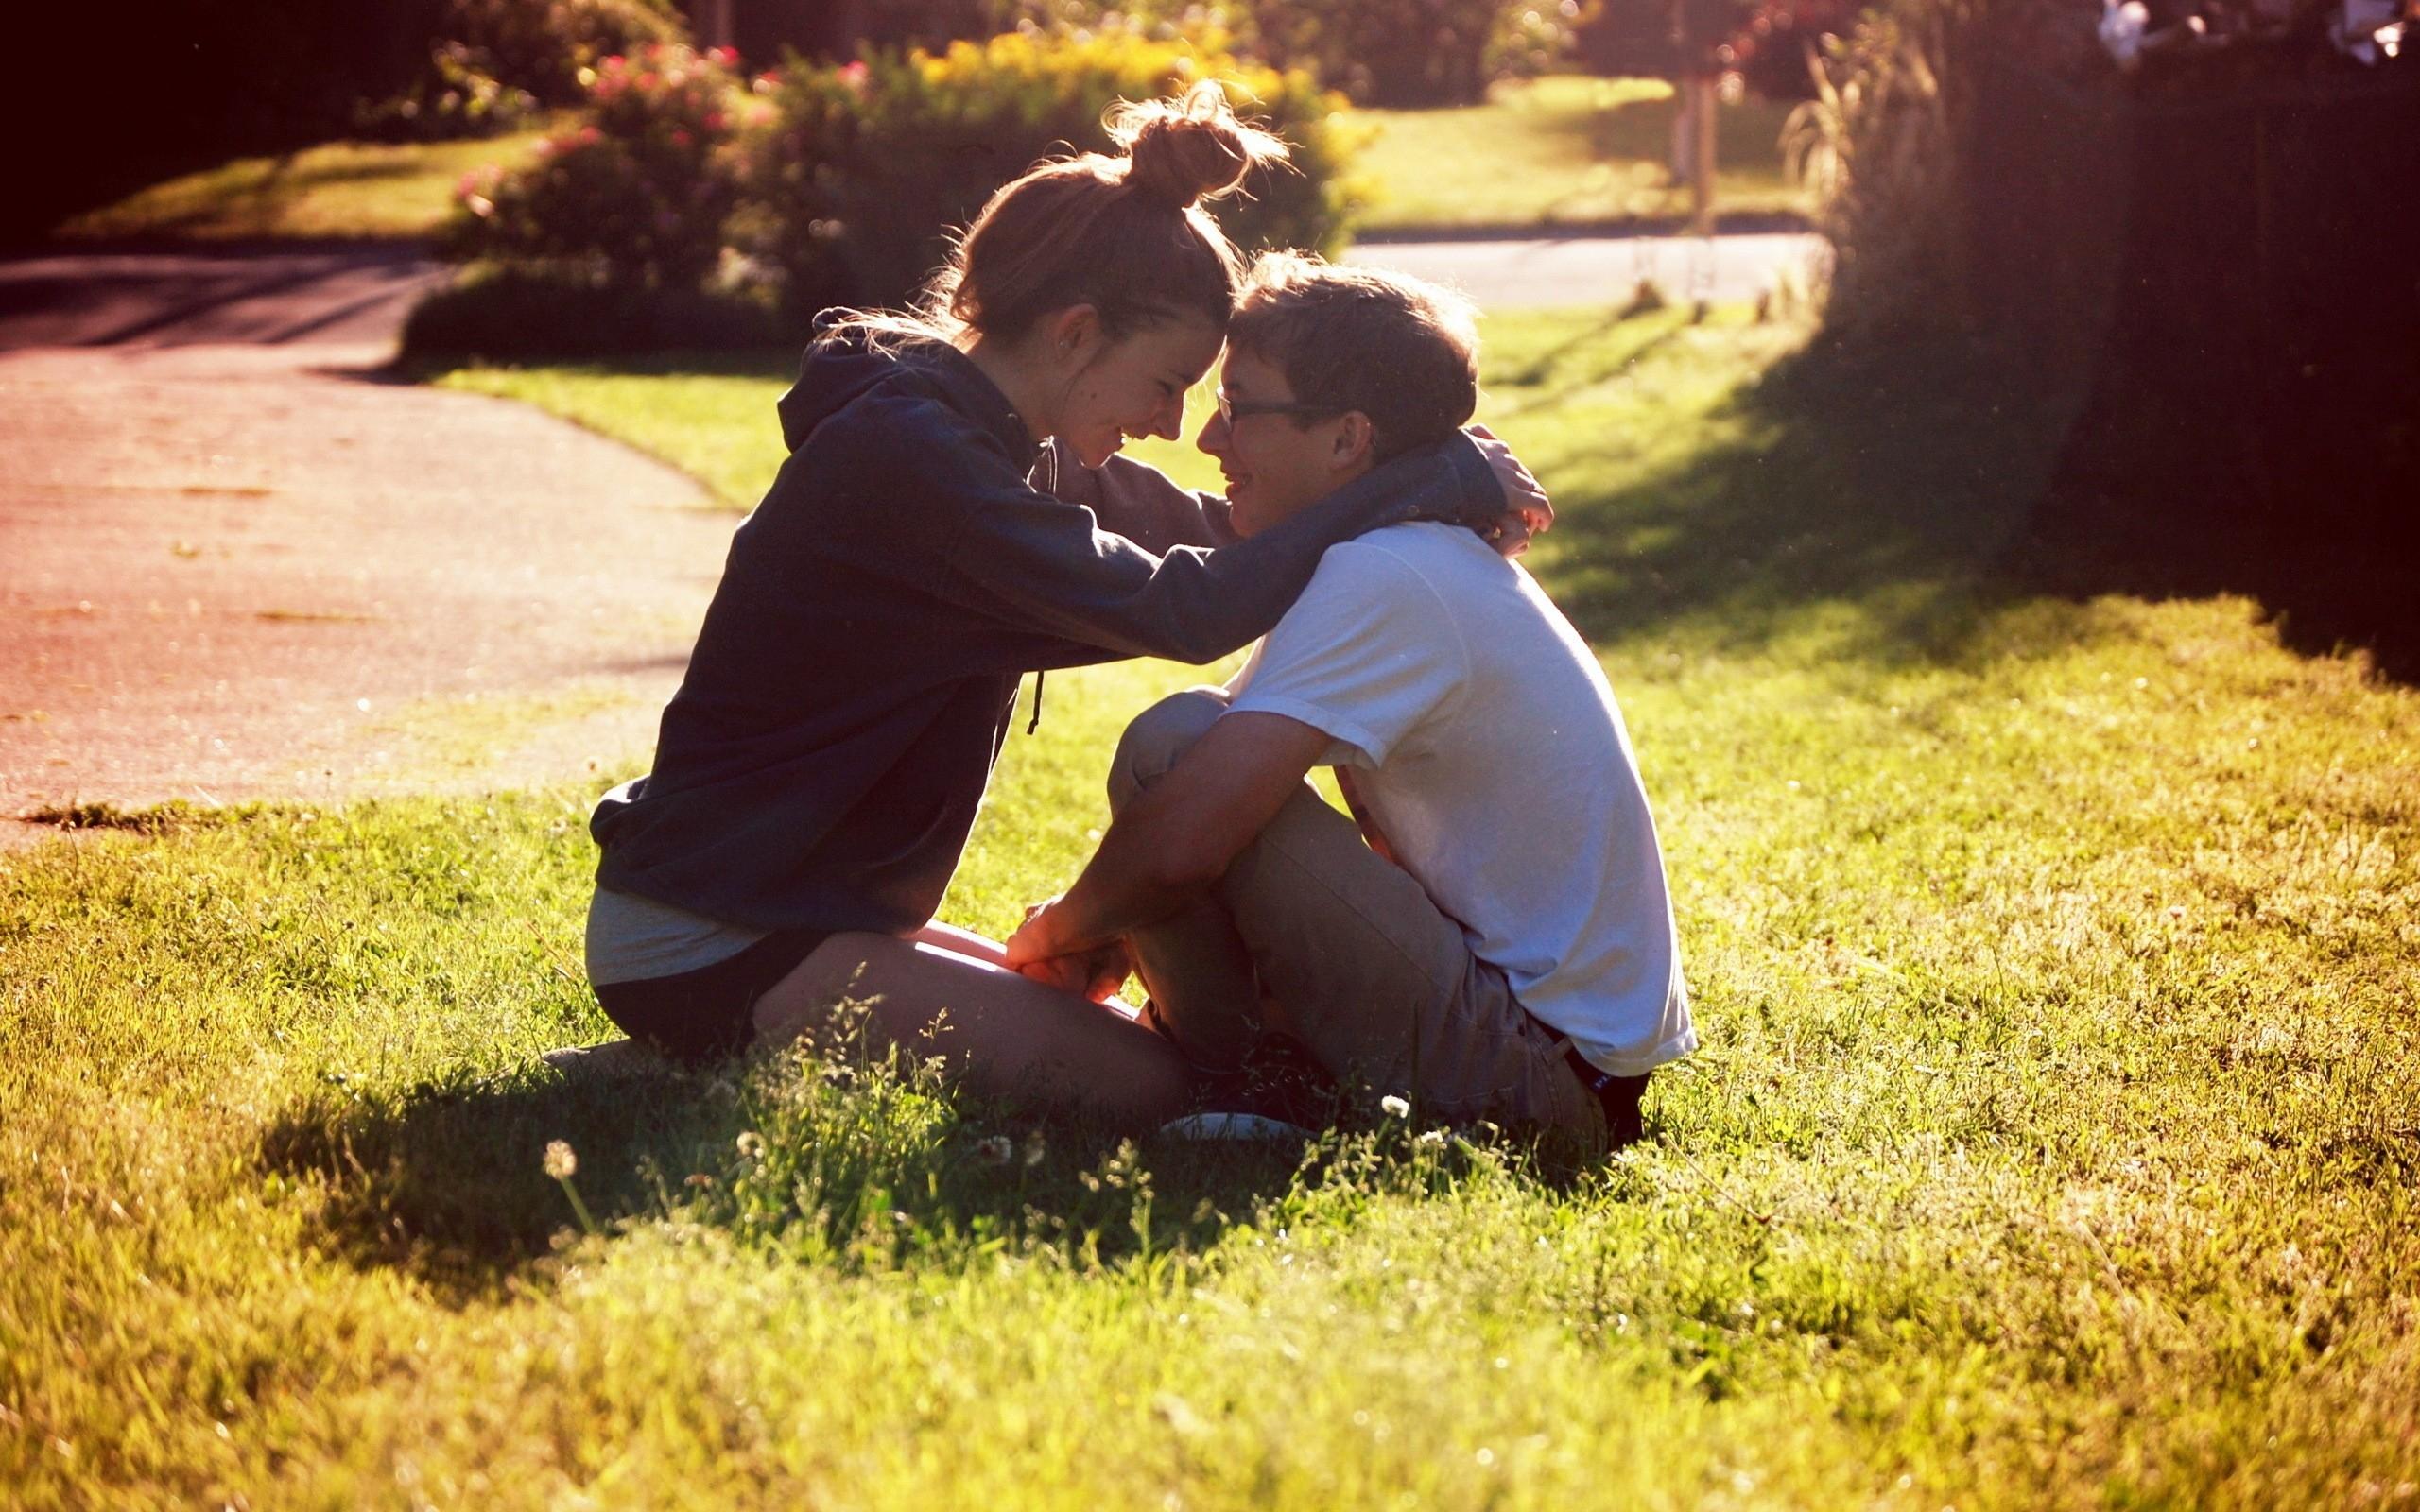 Wallpaper Sunlight Love Grass Couple Emotion Lovers